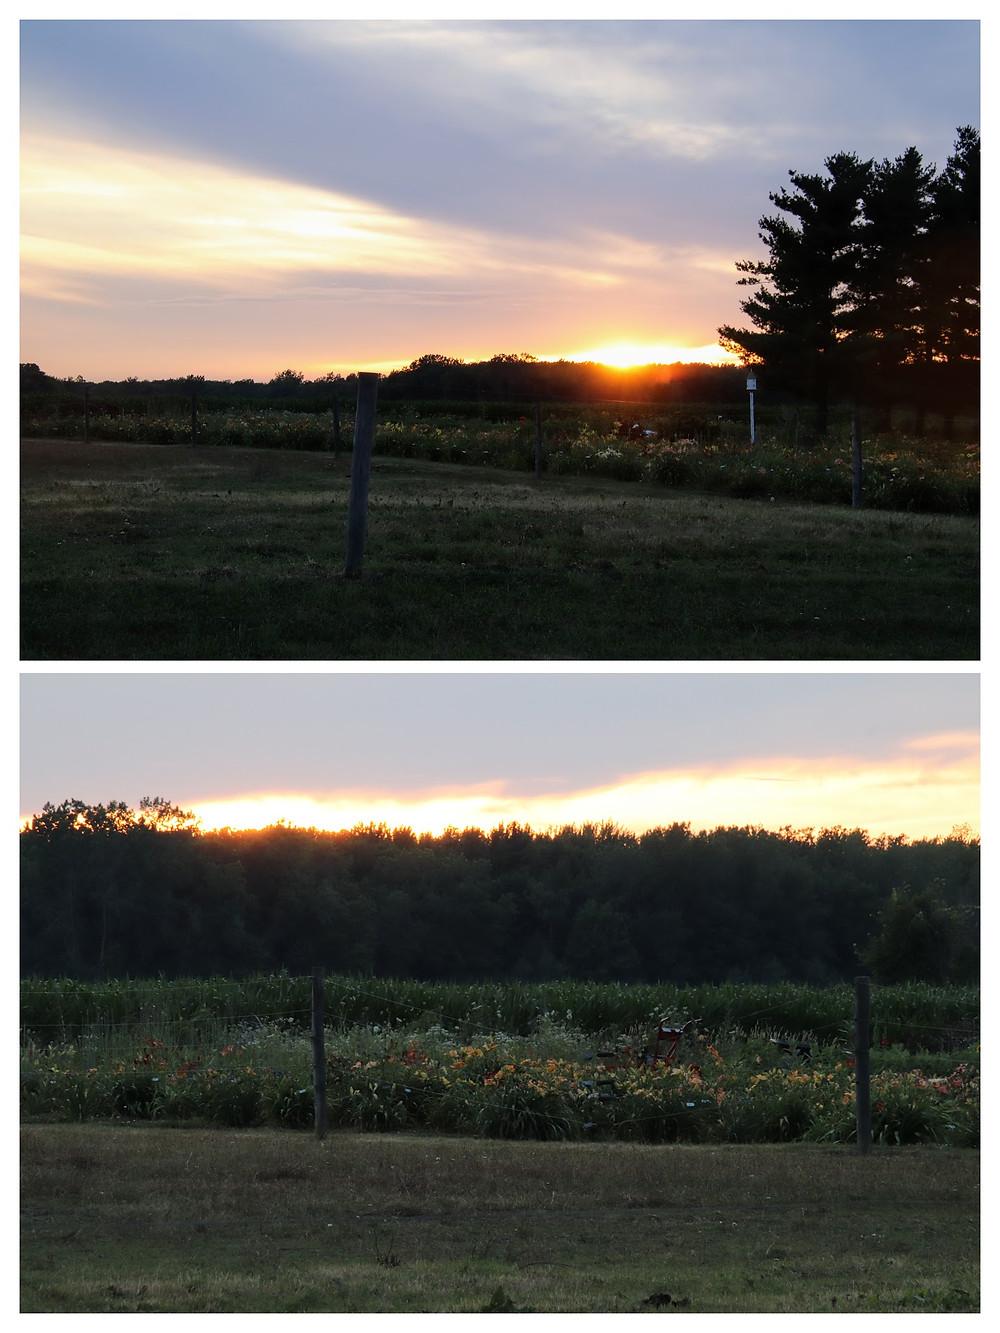 Sun Setting Over the DayLillies